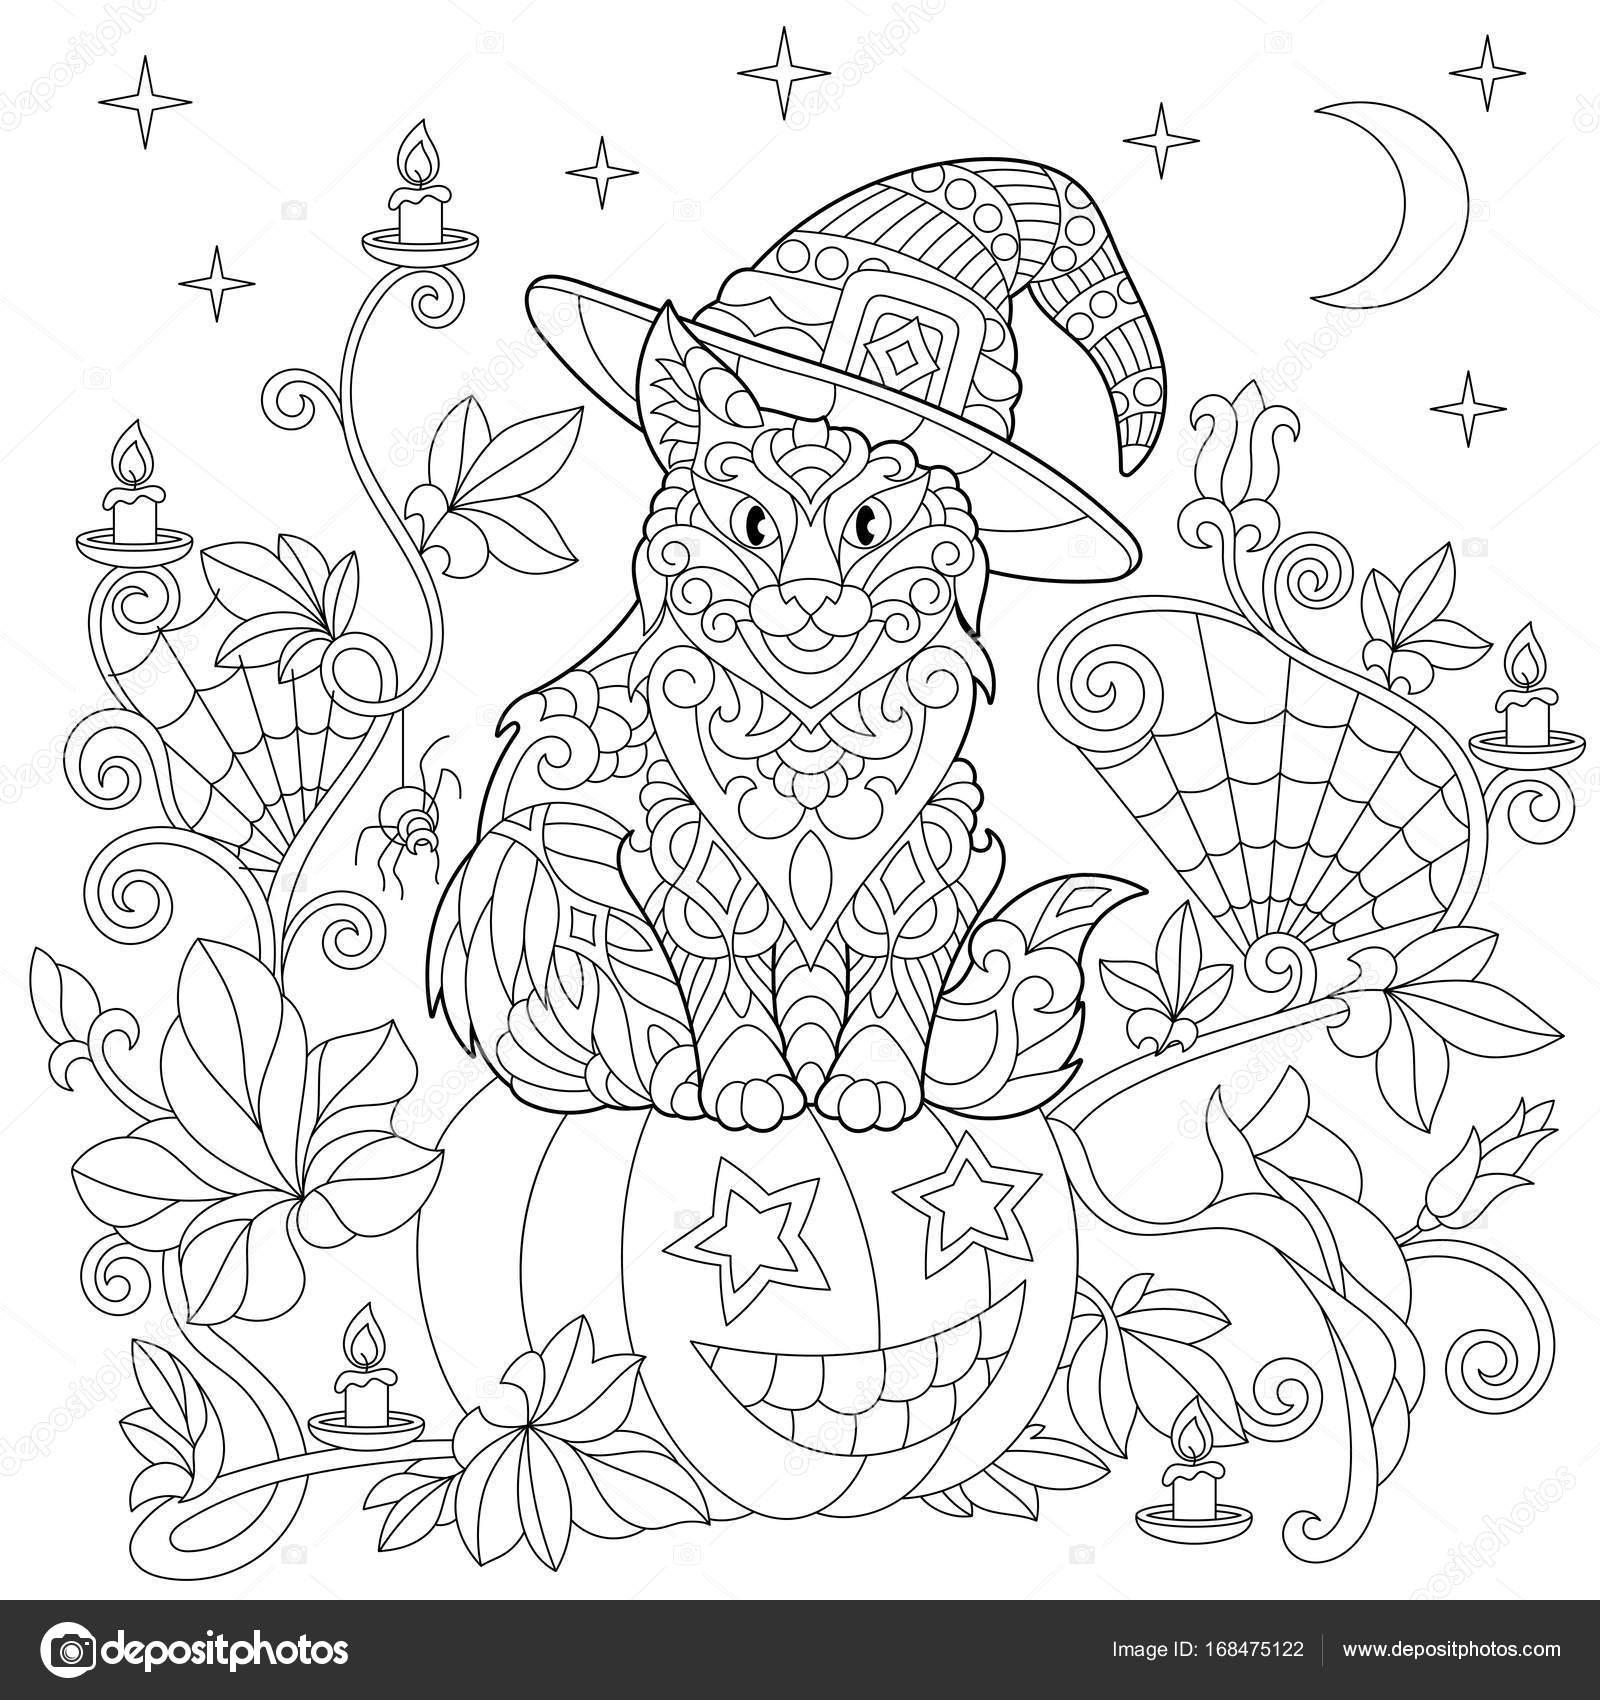 Zentangle Stilisiert Halloween Malvorlagen Stockvektor Sybirko